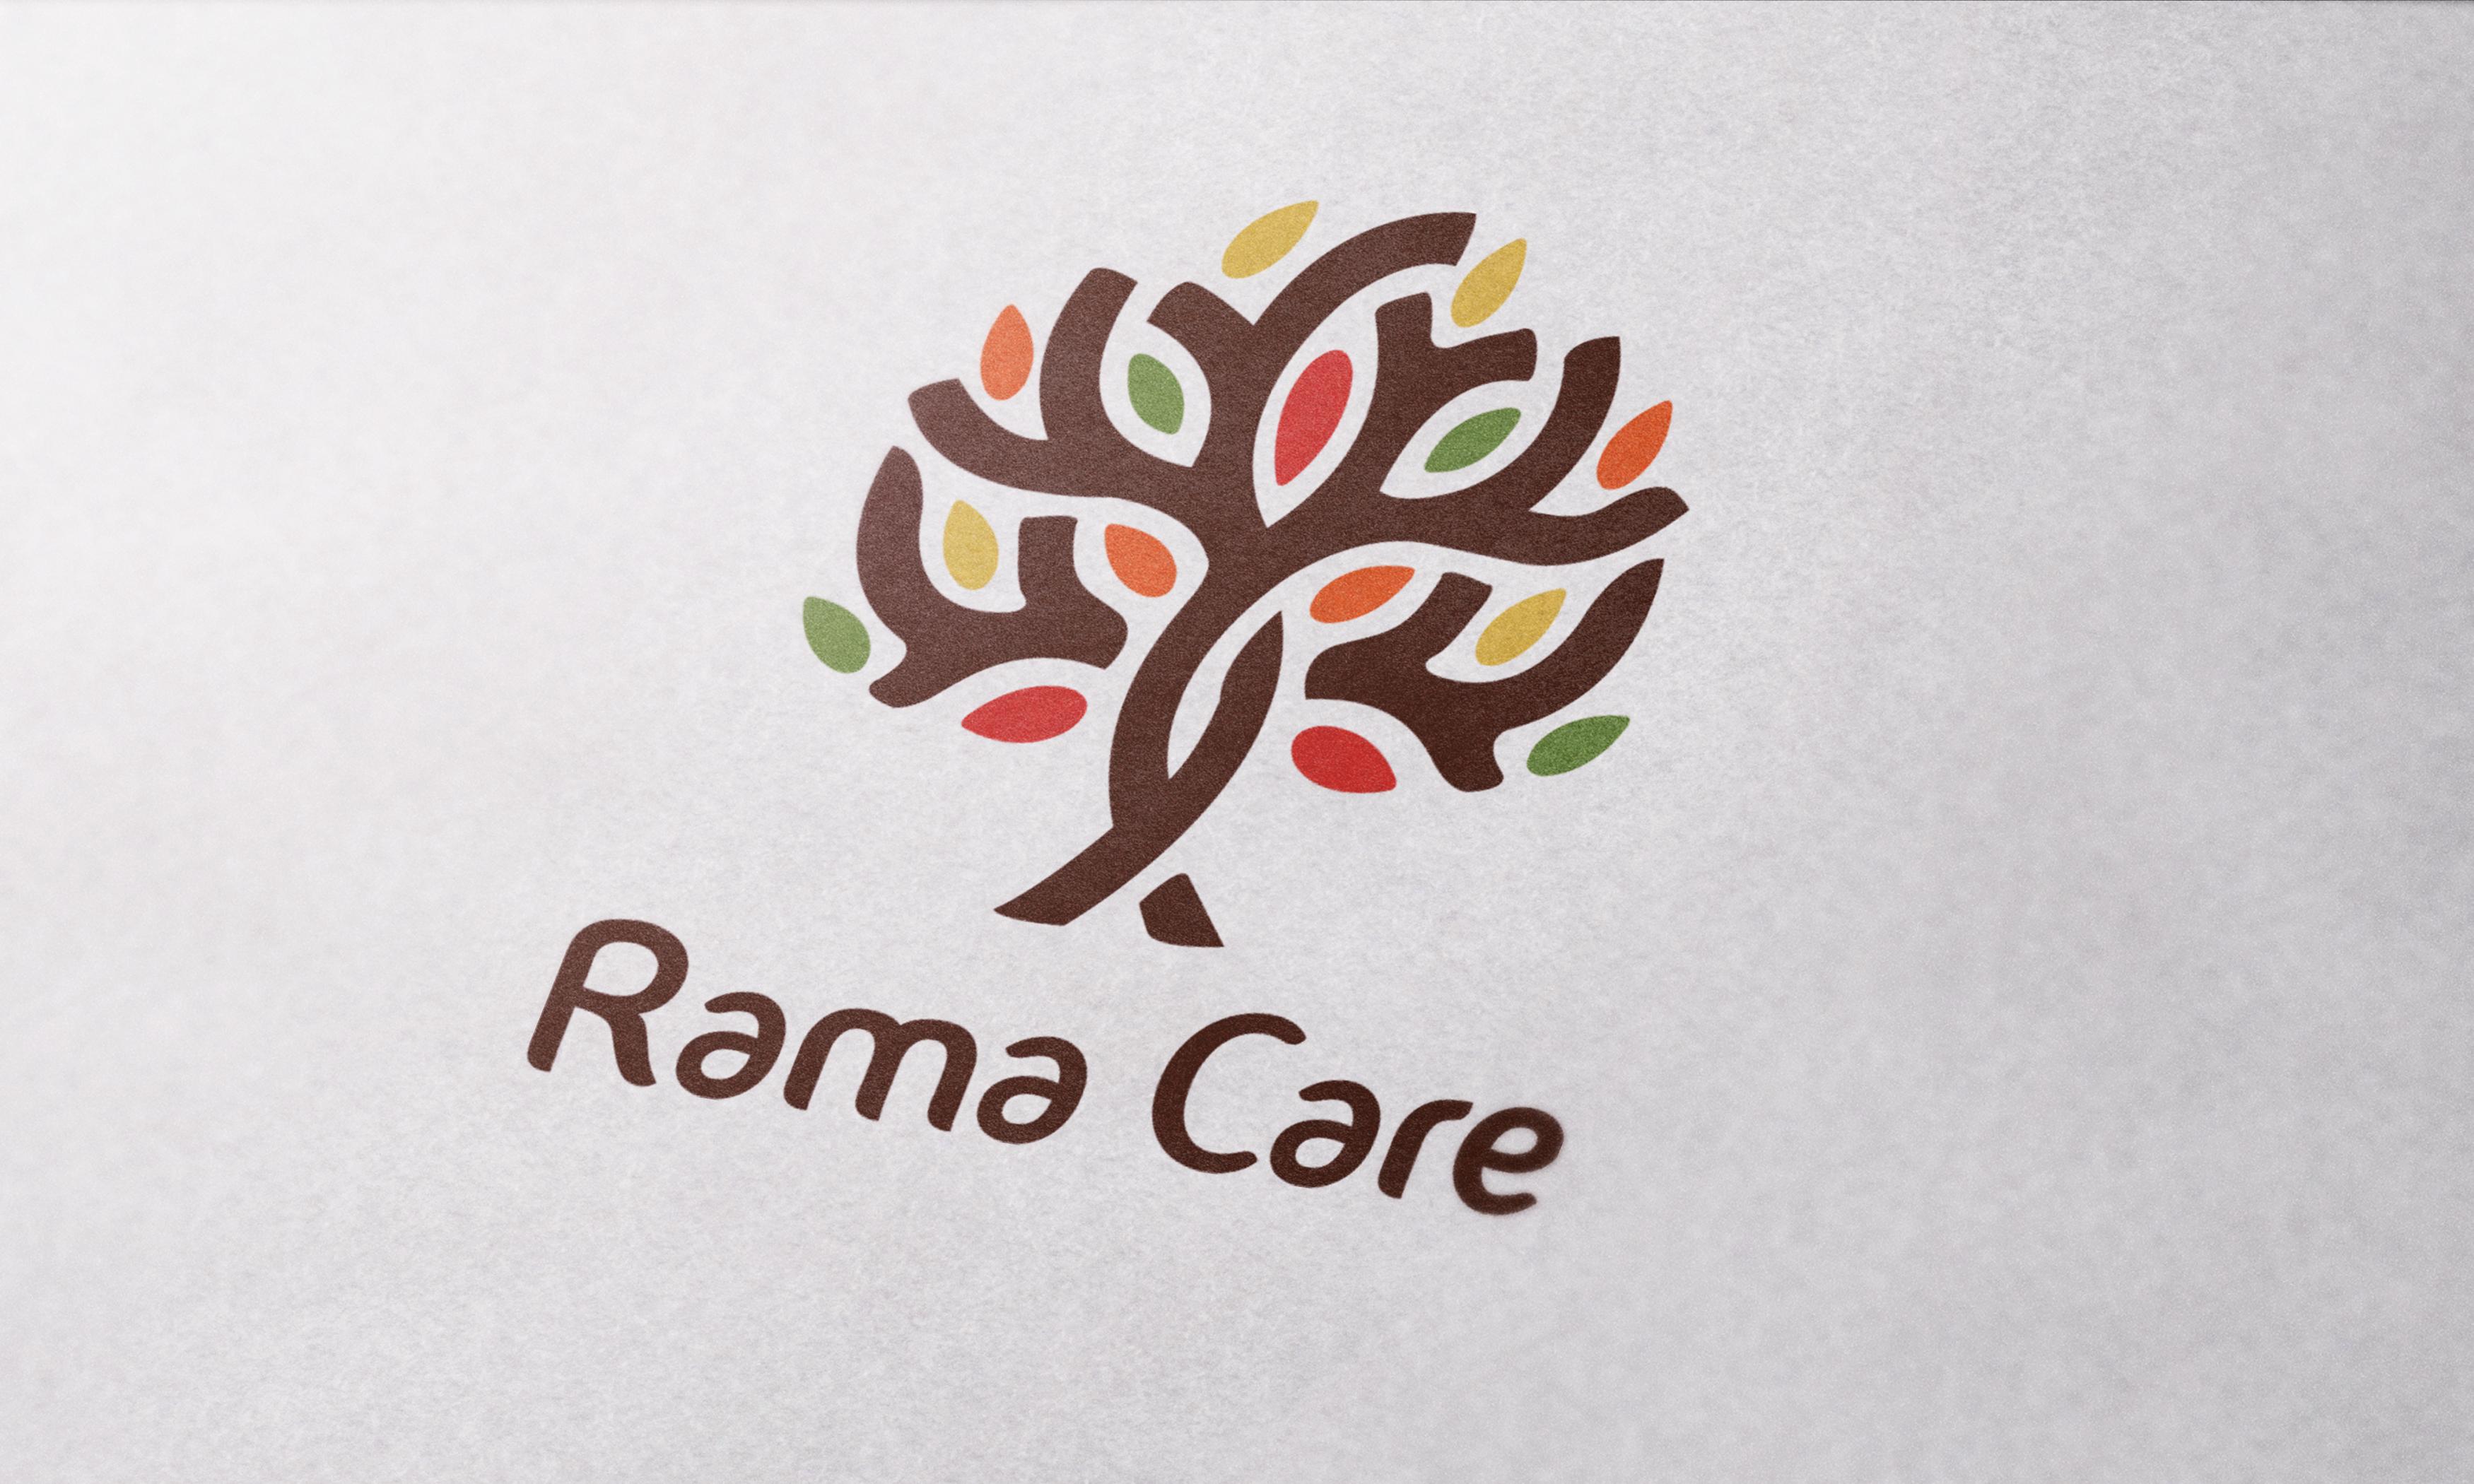 Rama Care